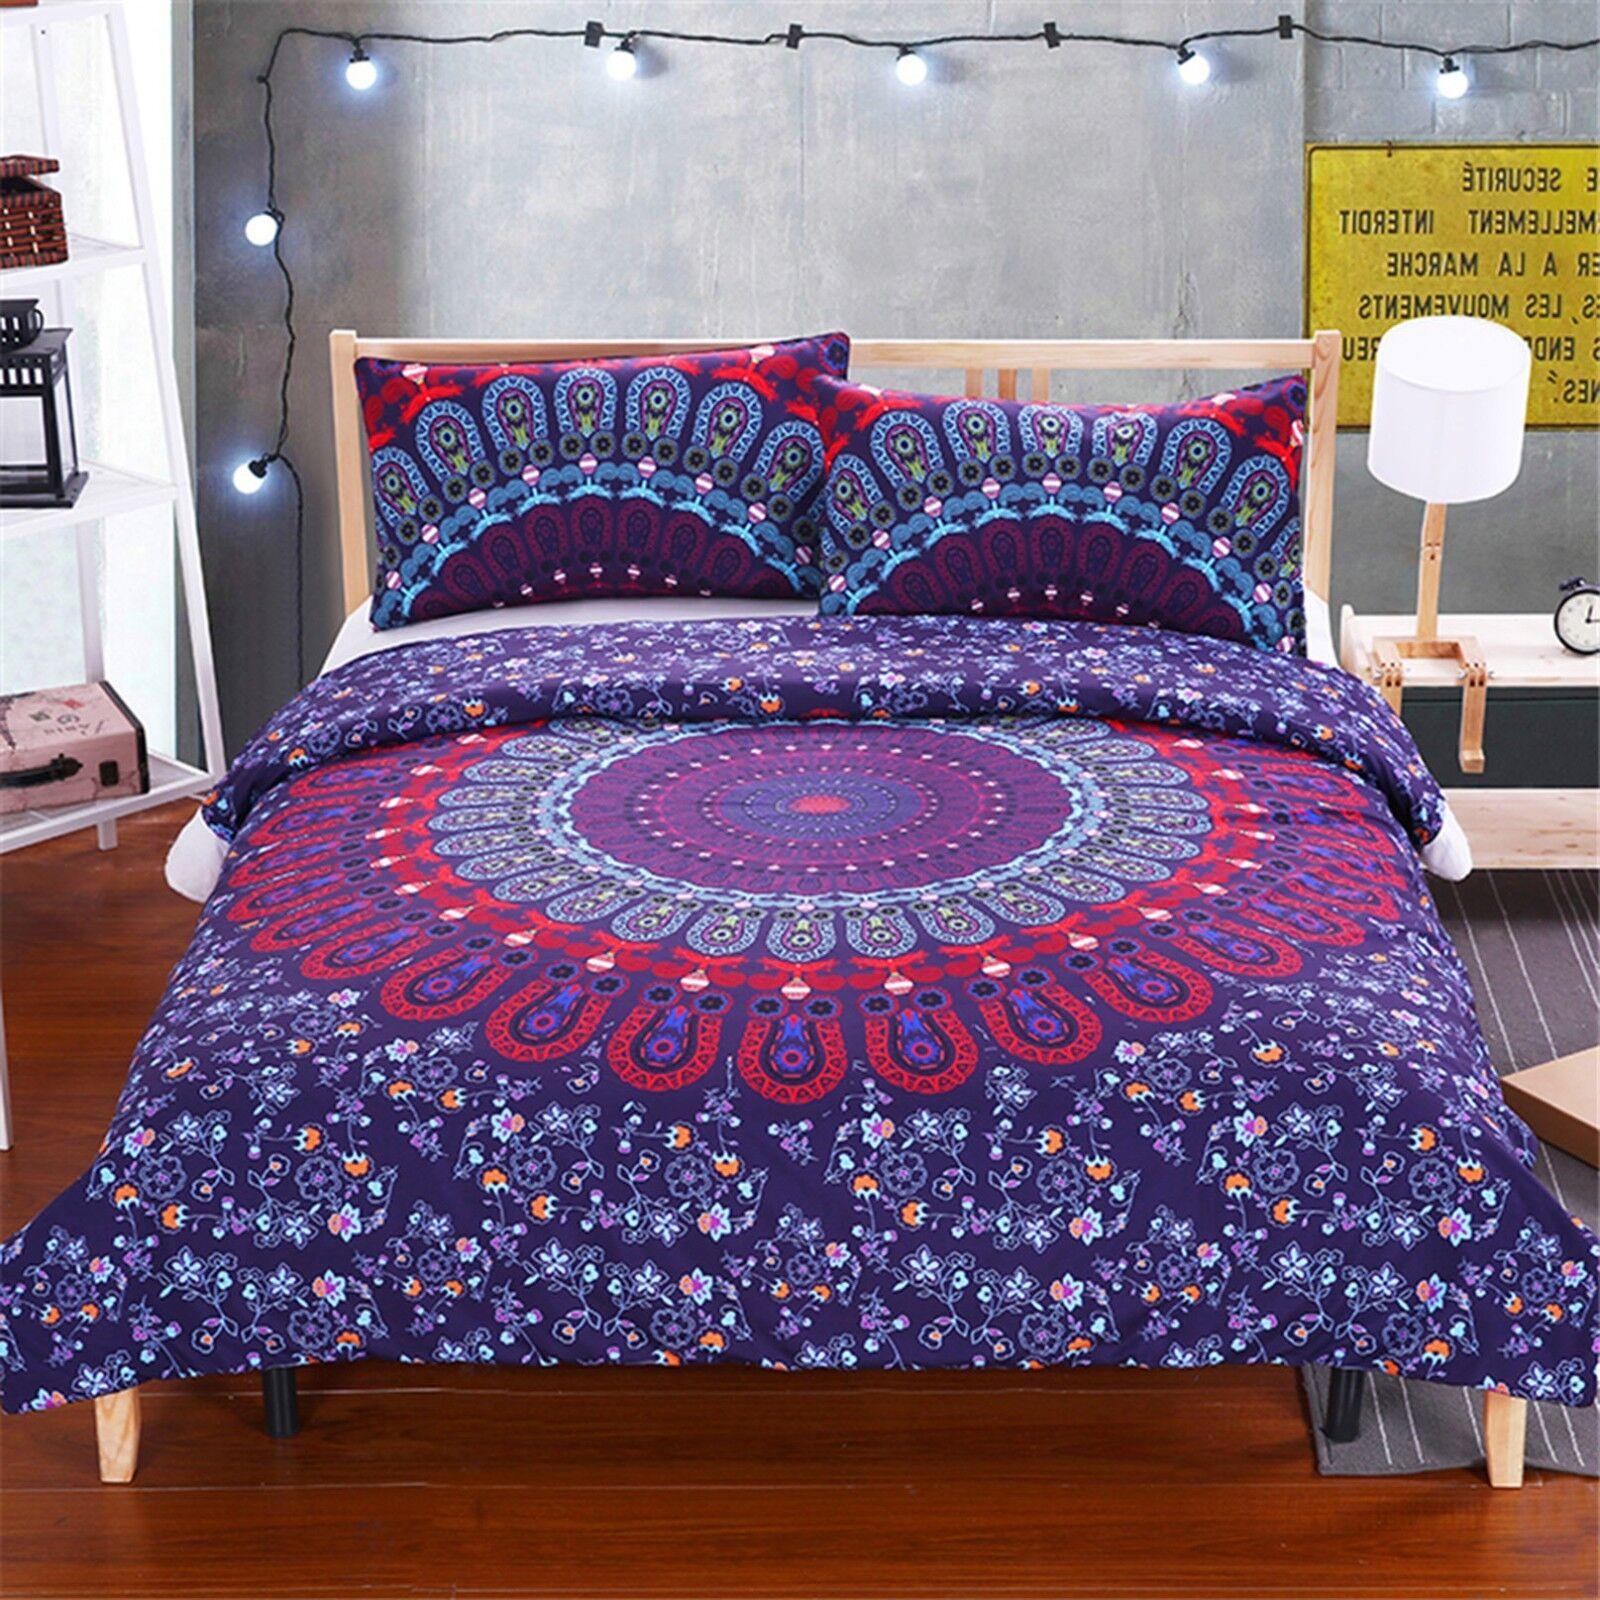 3D Blau Pattern 472 Bed Pillowcases Quilt Duvet Cover Set Single Queen CA